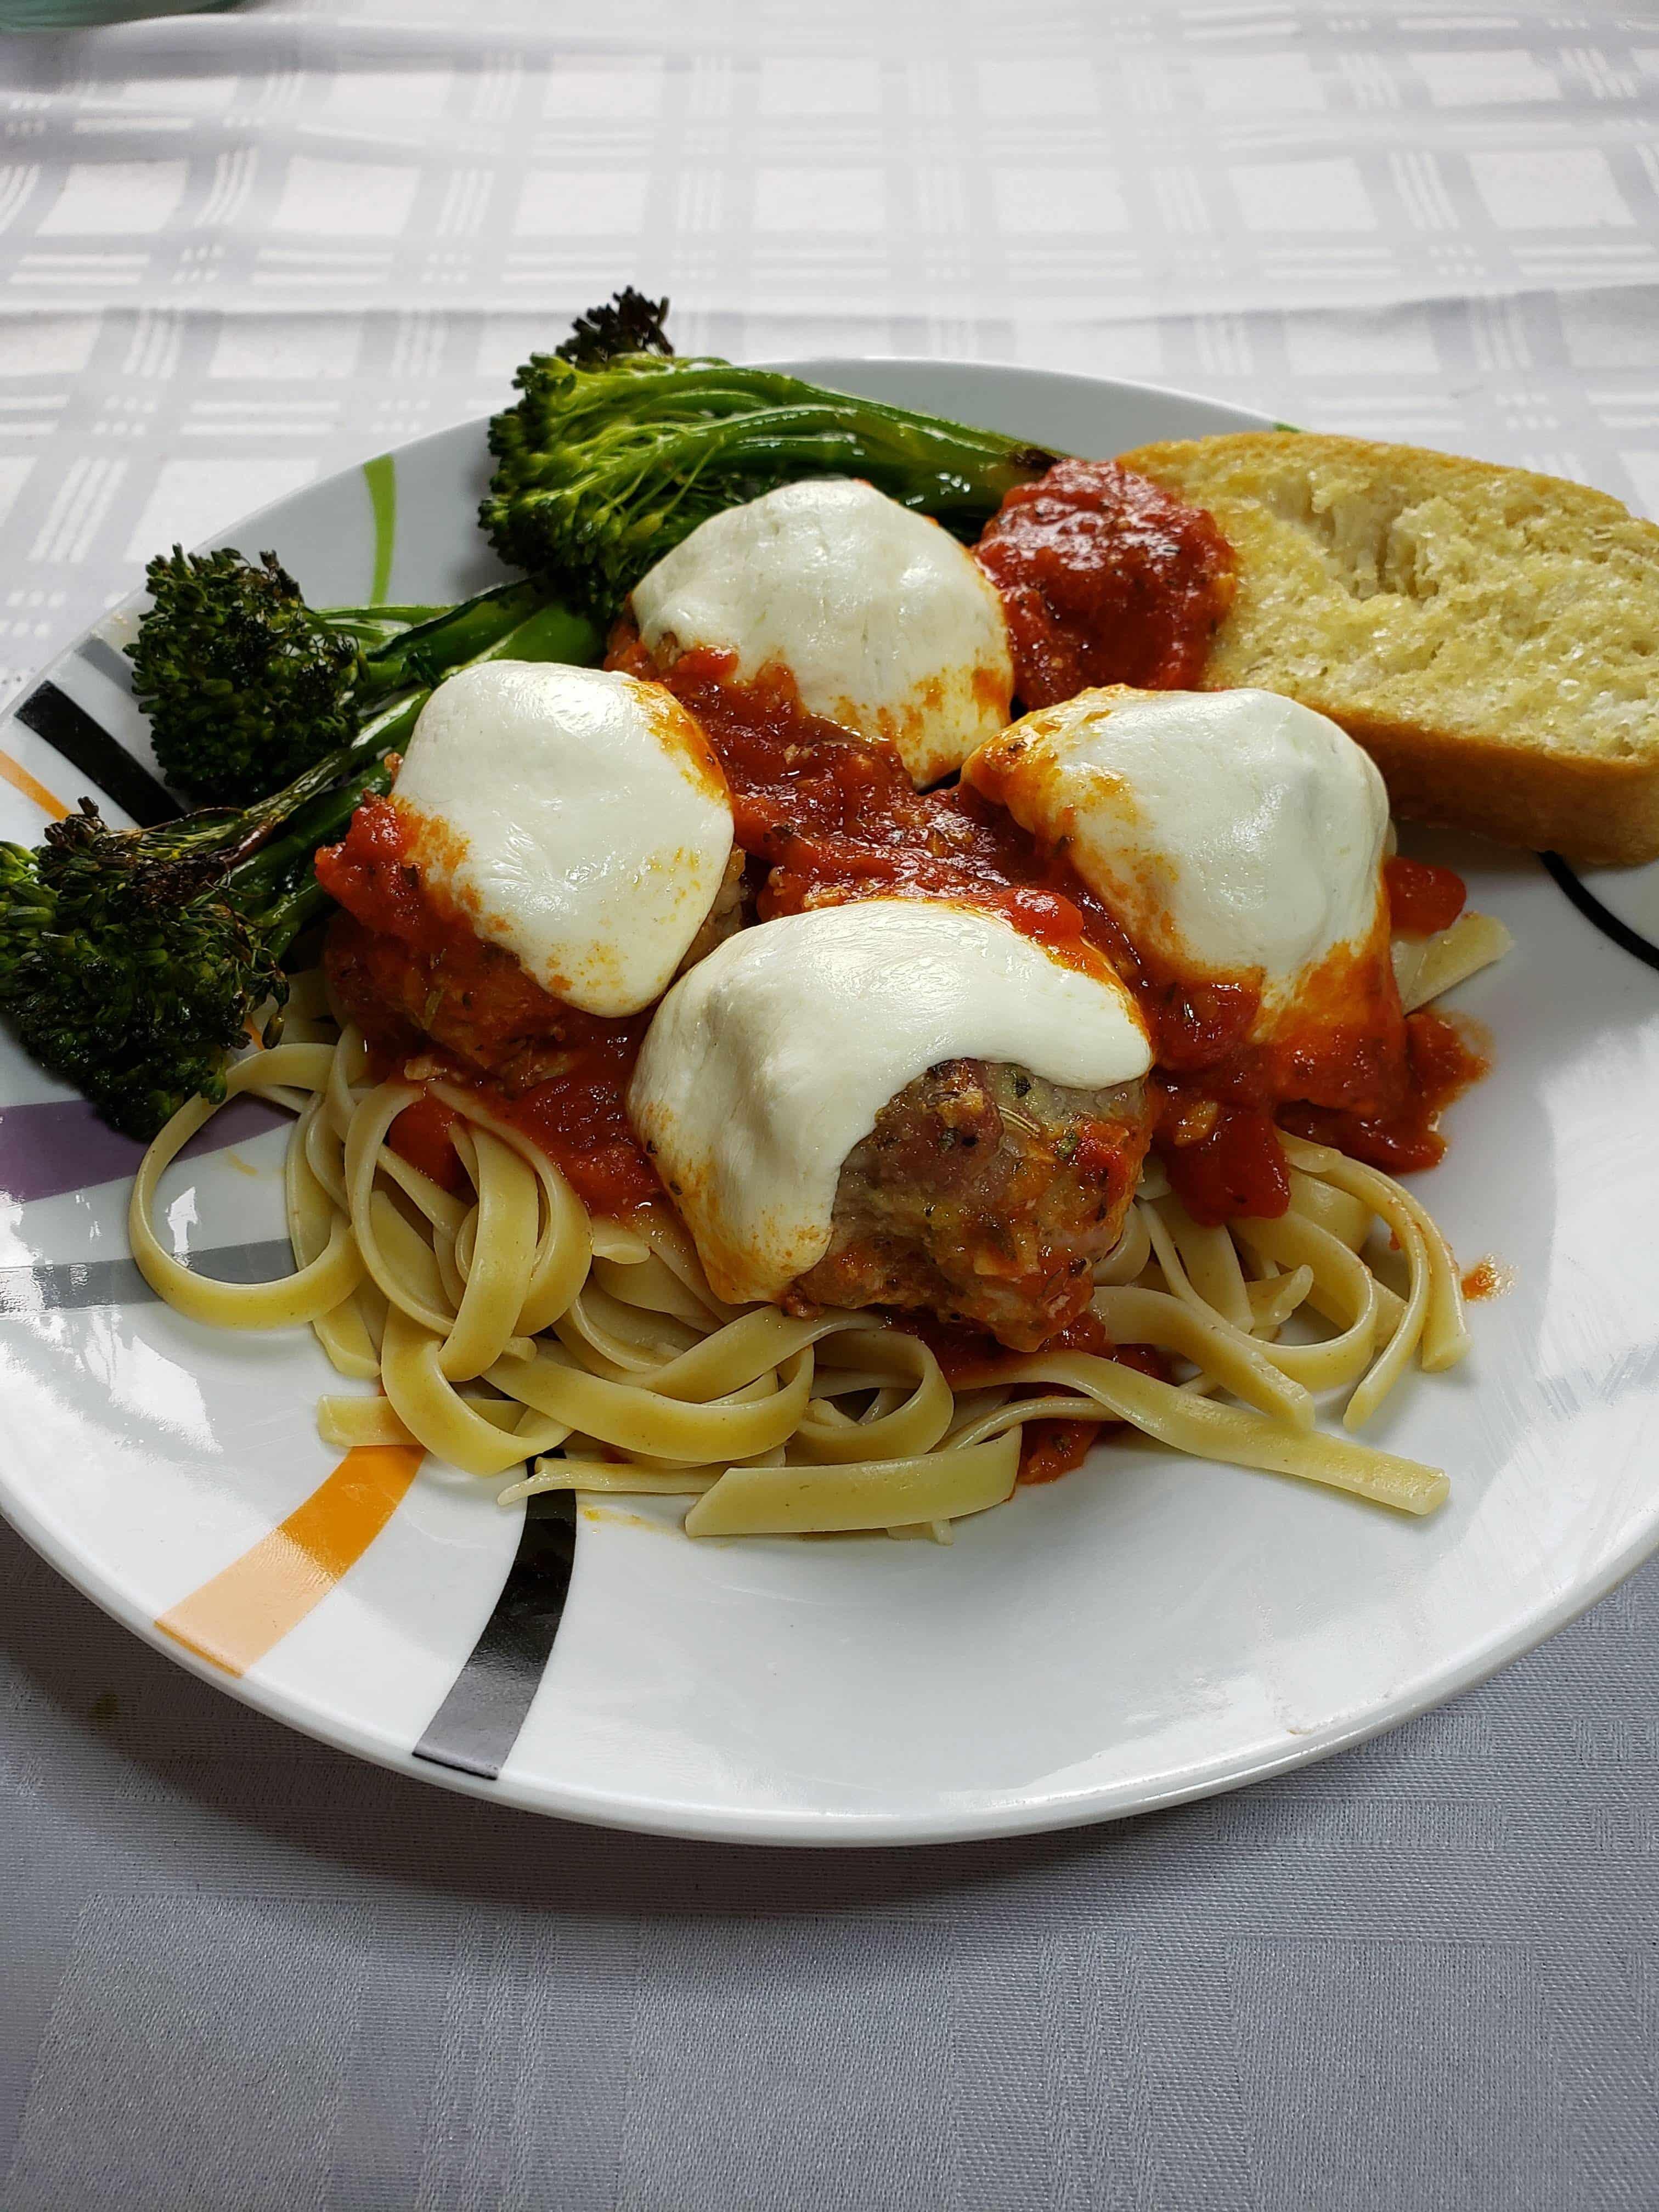 Skillet Pork Meatball Parmesan Dinner